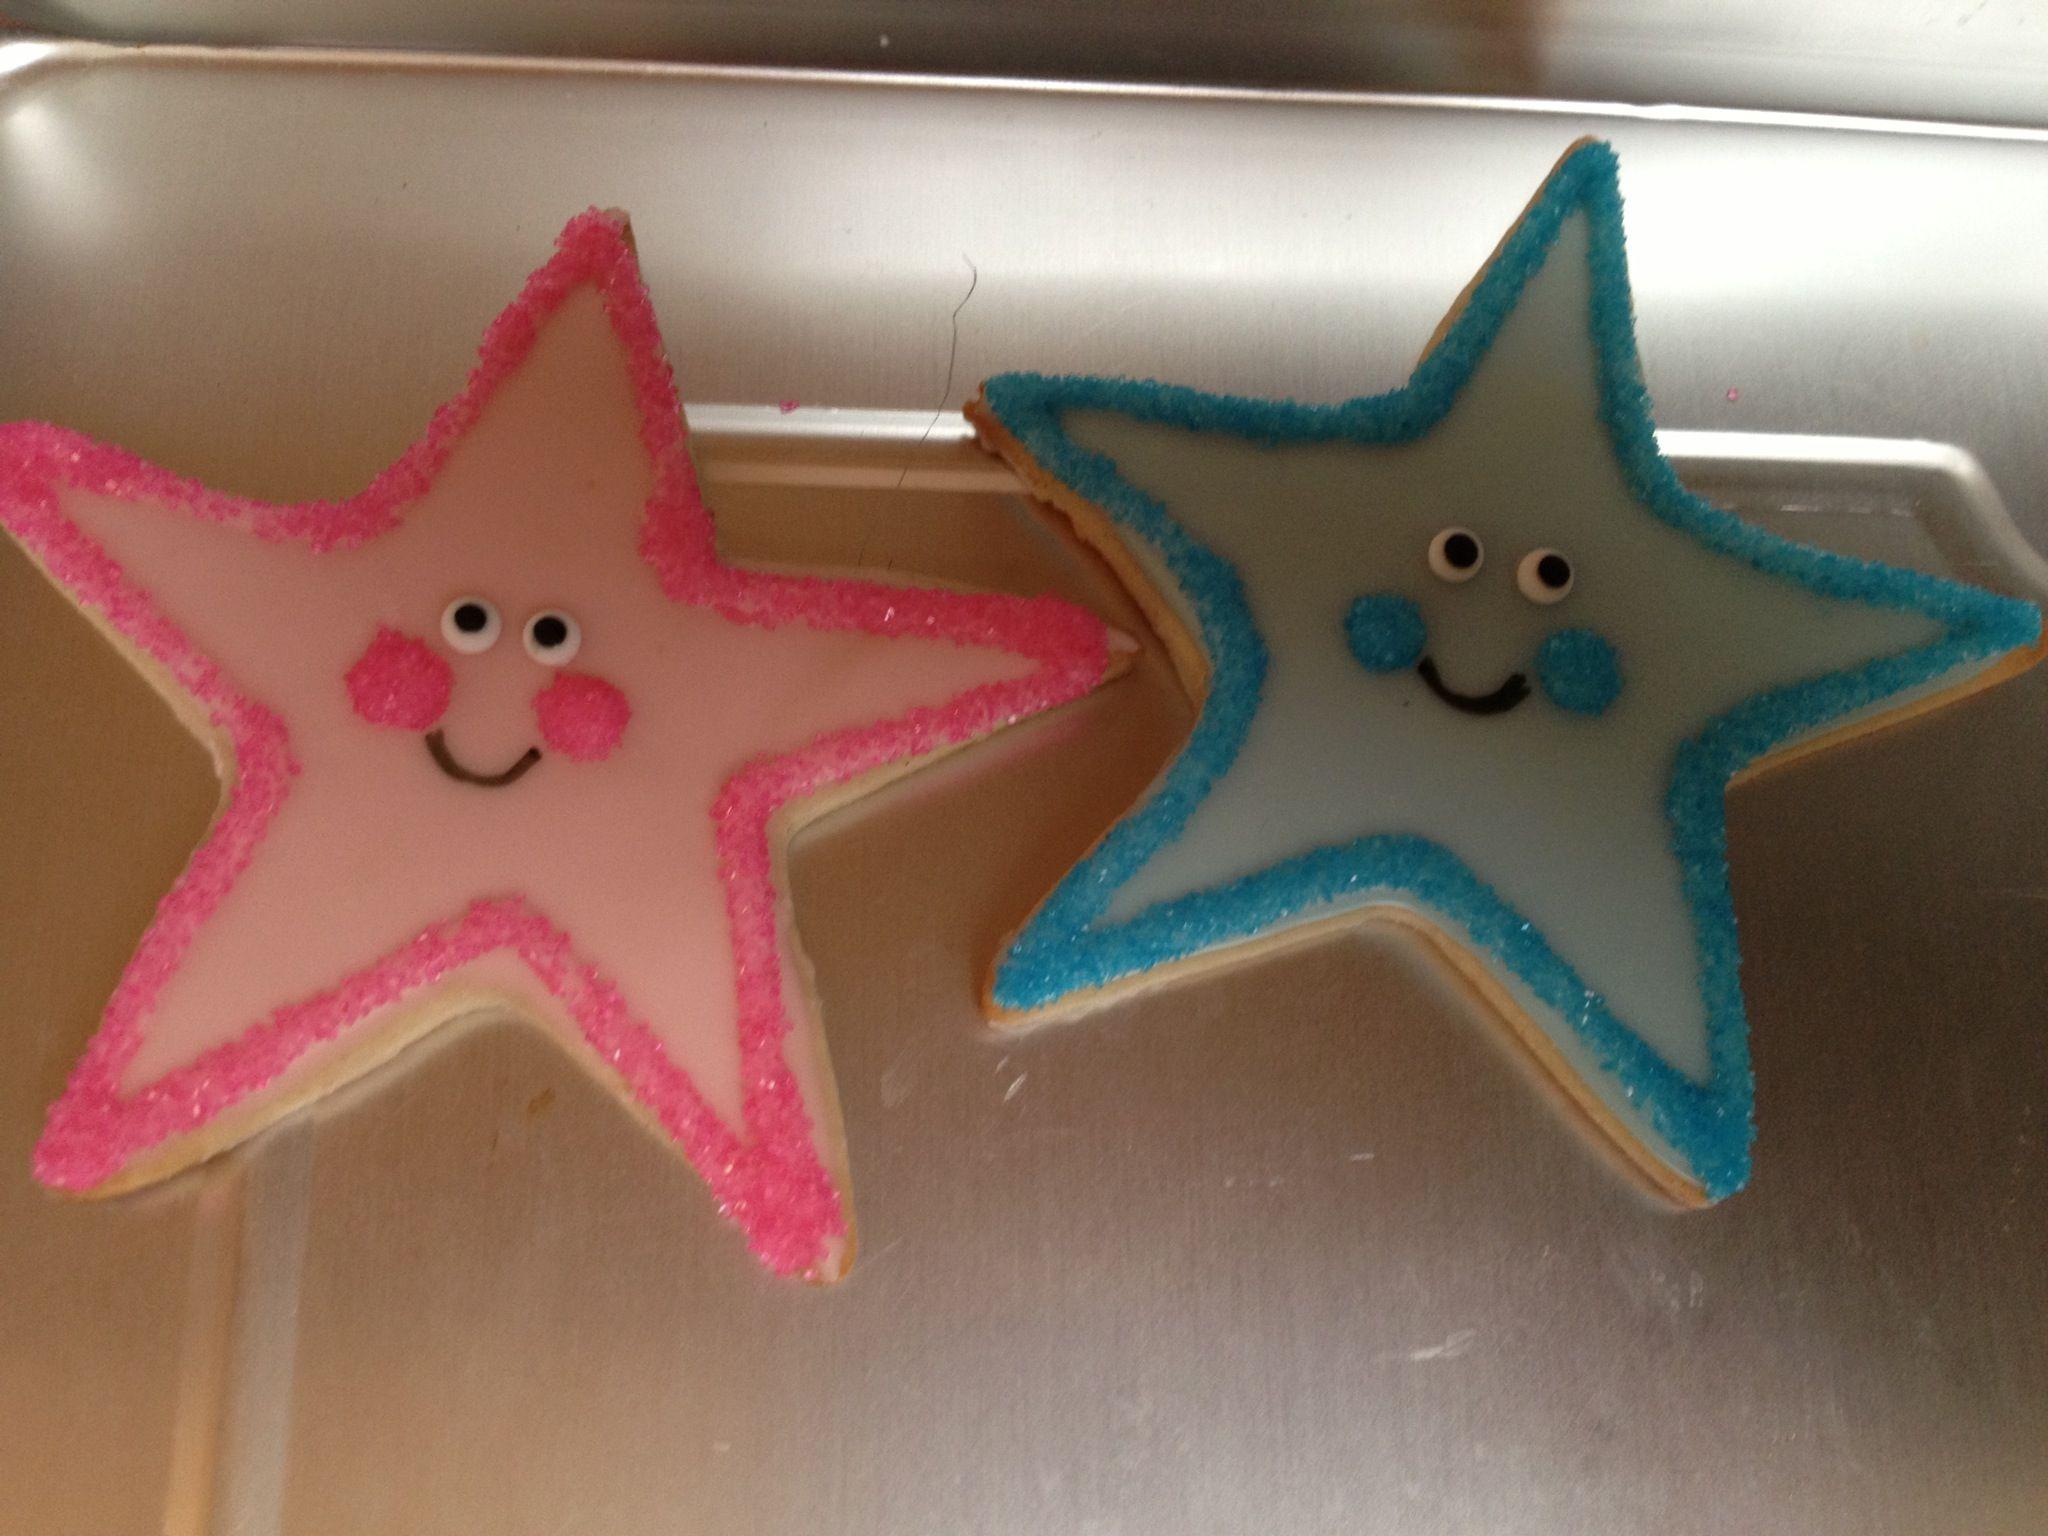 Twinkle twinkle little star sugar cookies!